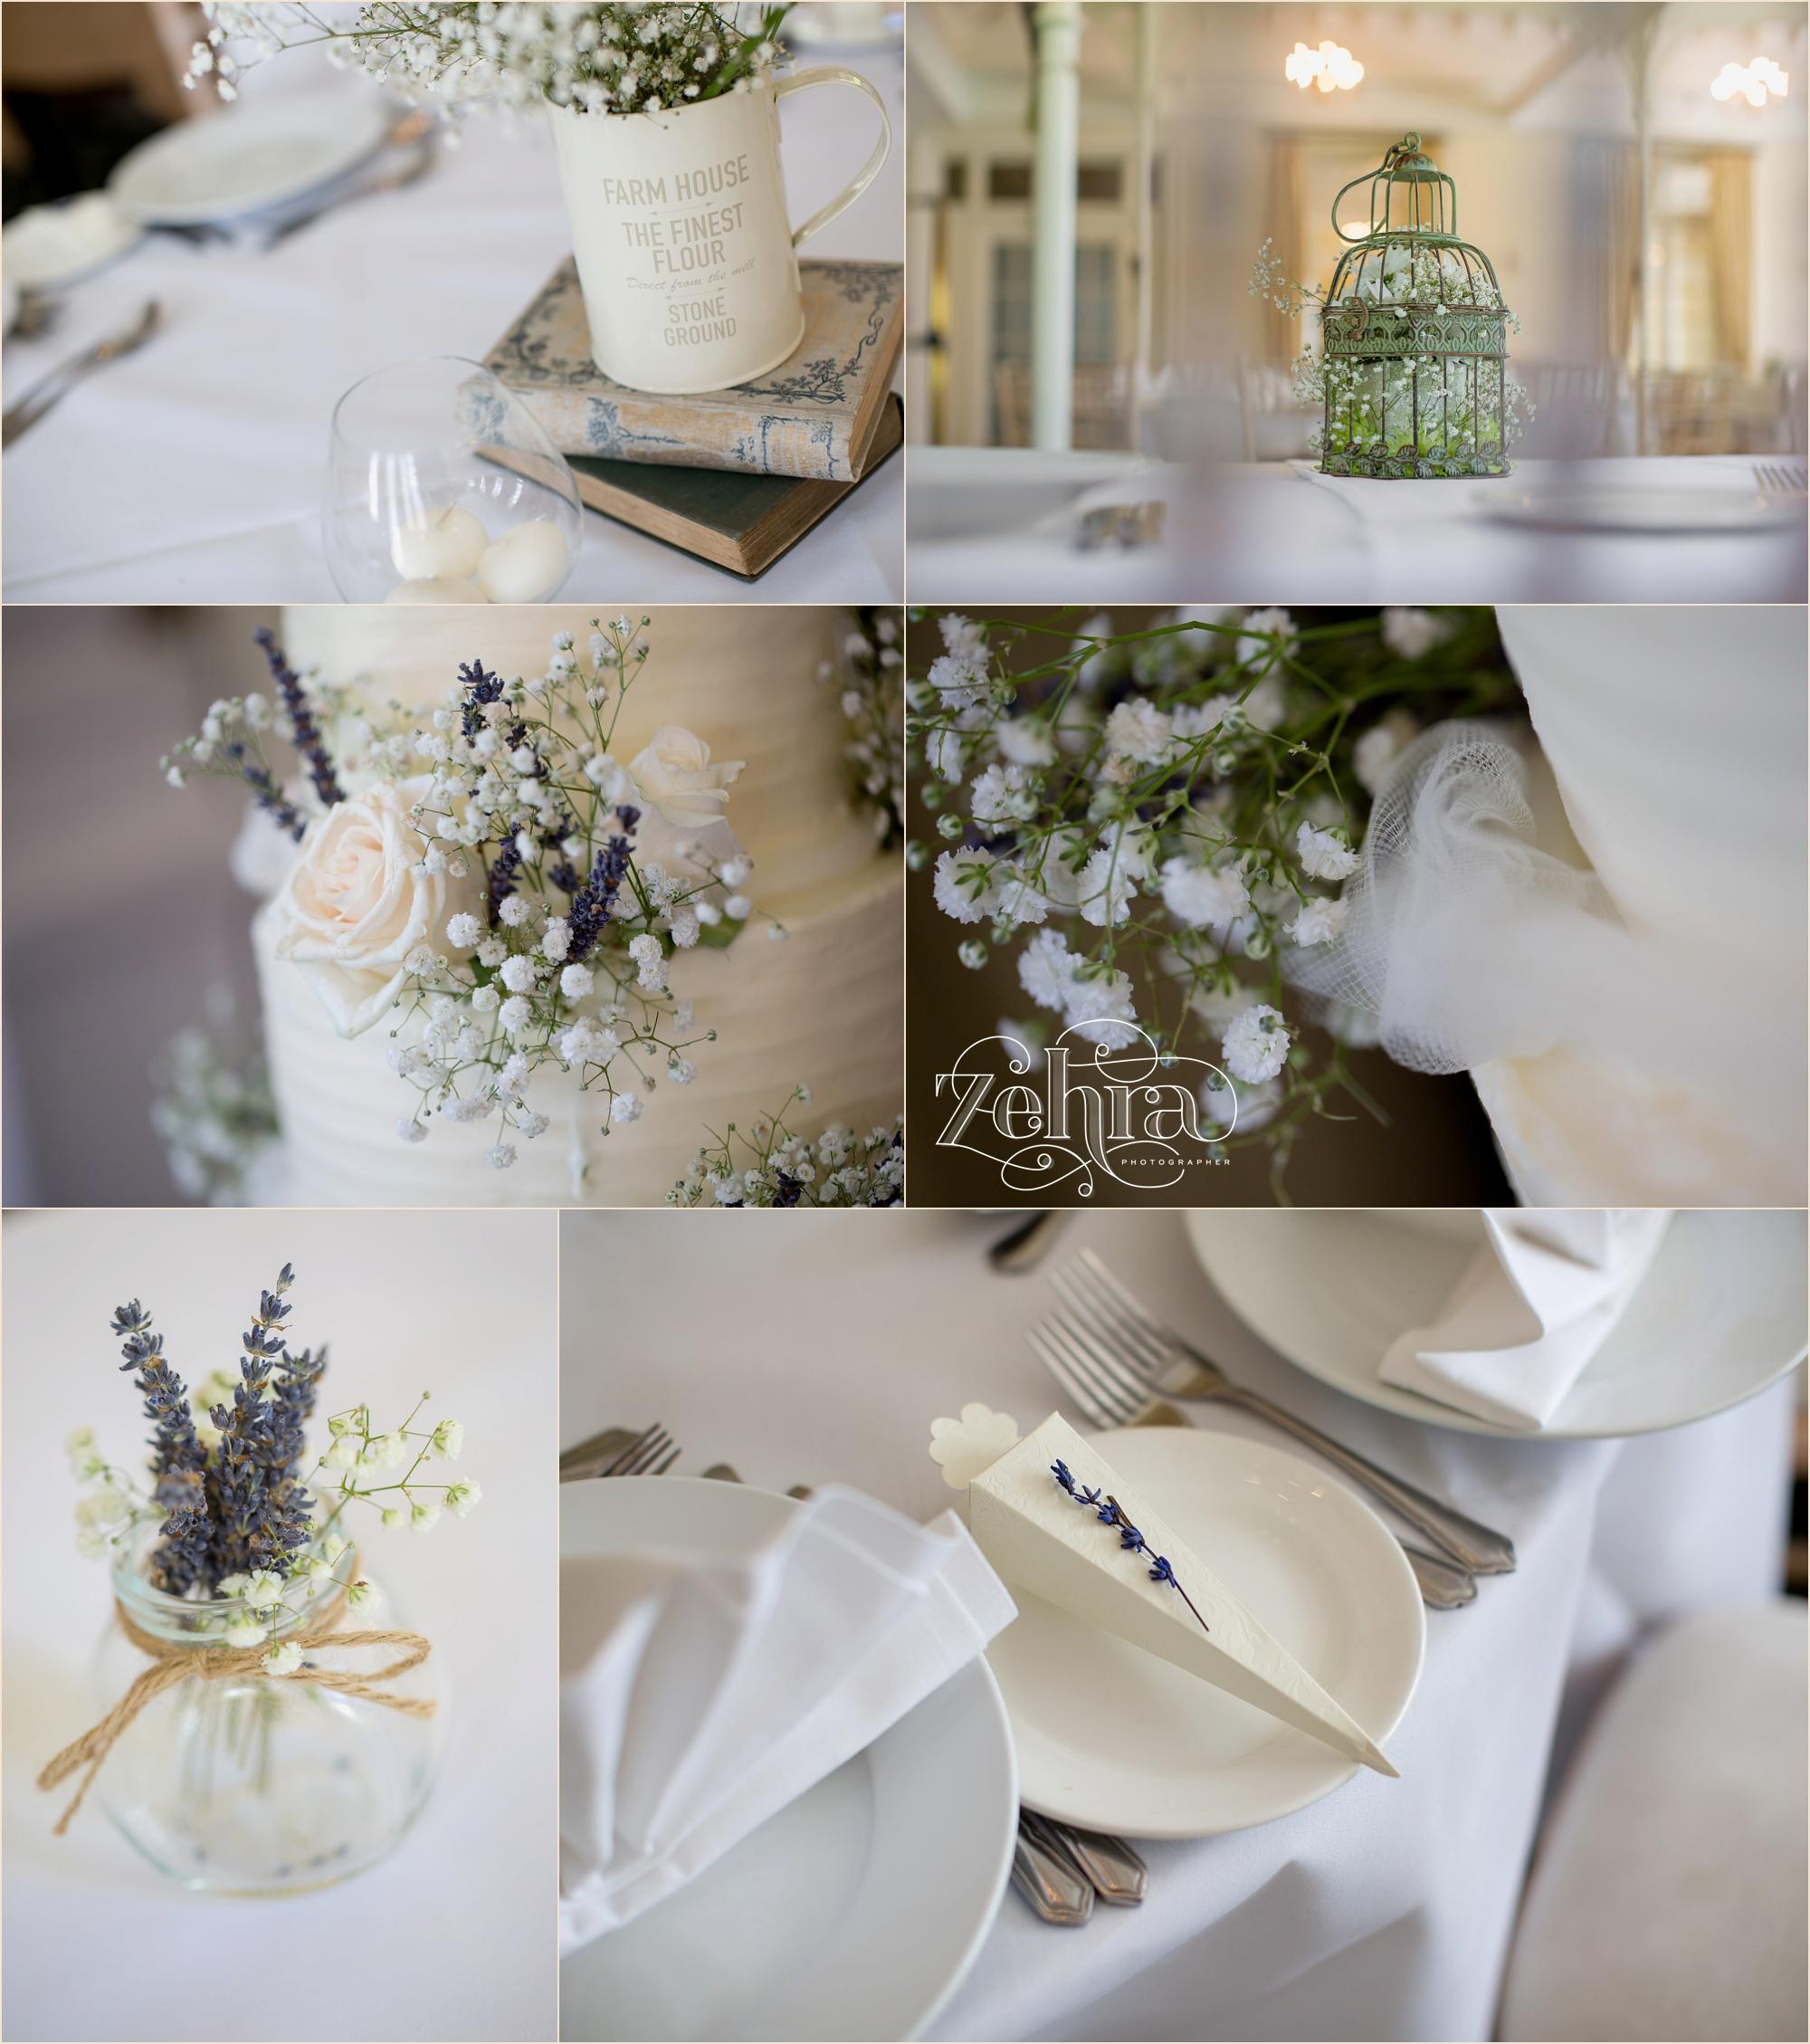 jasira manchester wedding photographer_0052.jpg